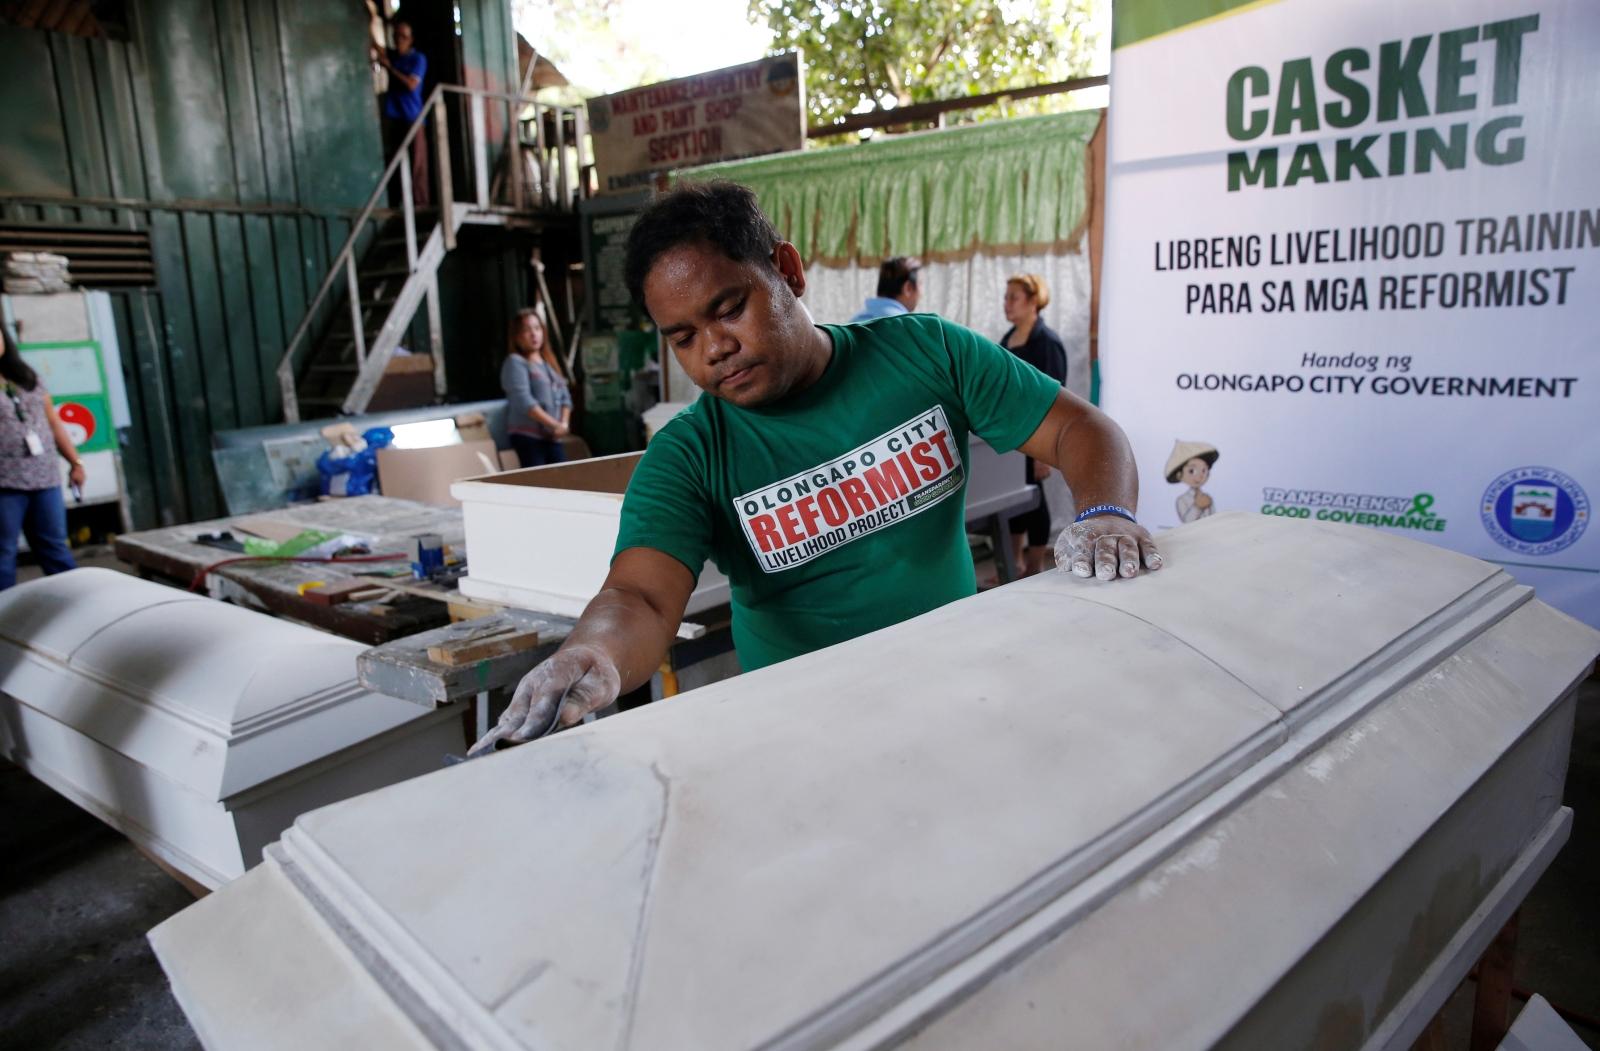 A former drug user undergoing rehabilitation makes coffins